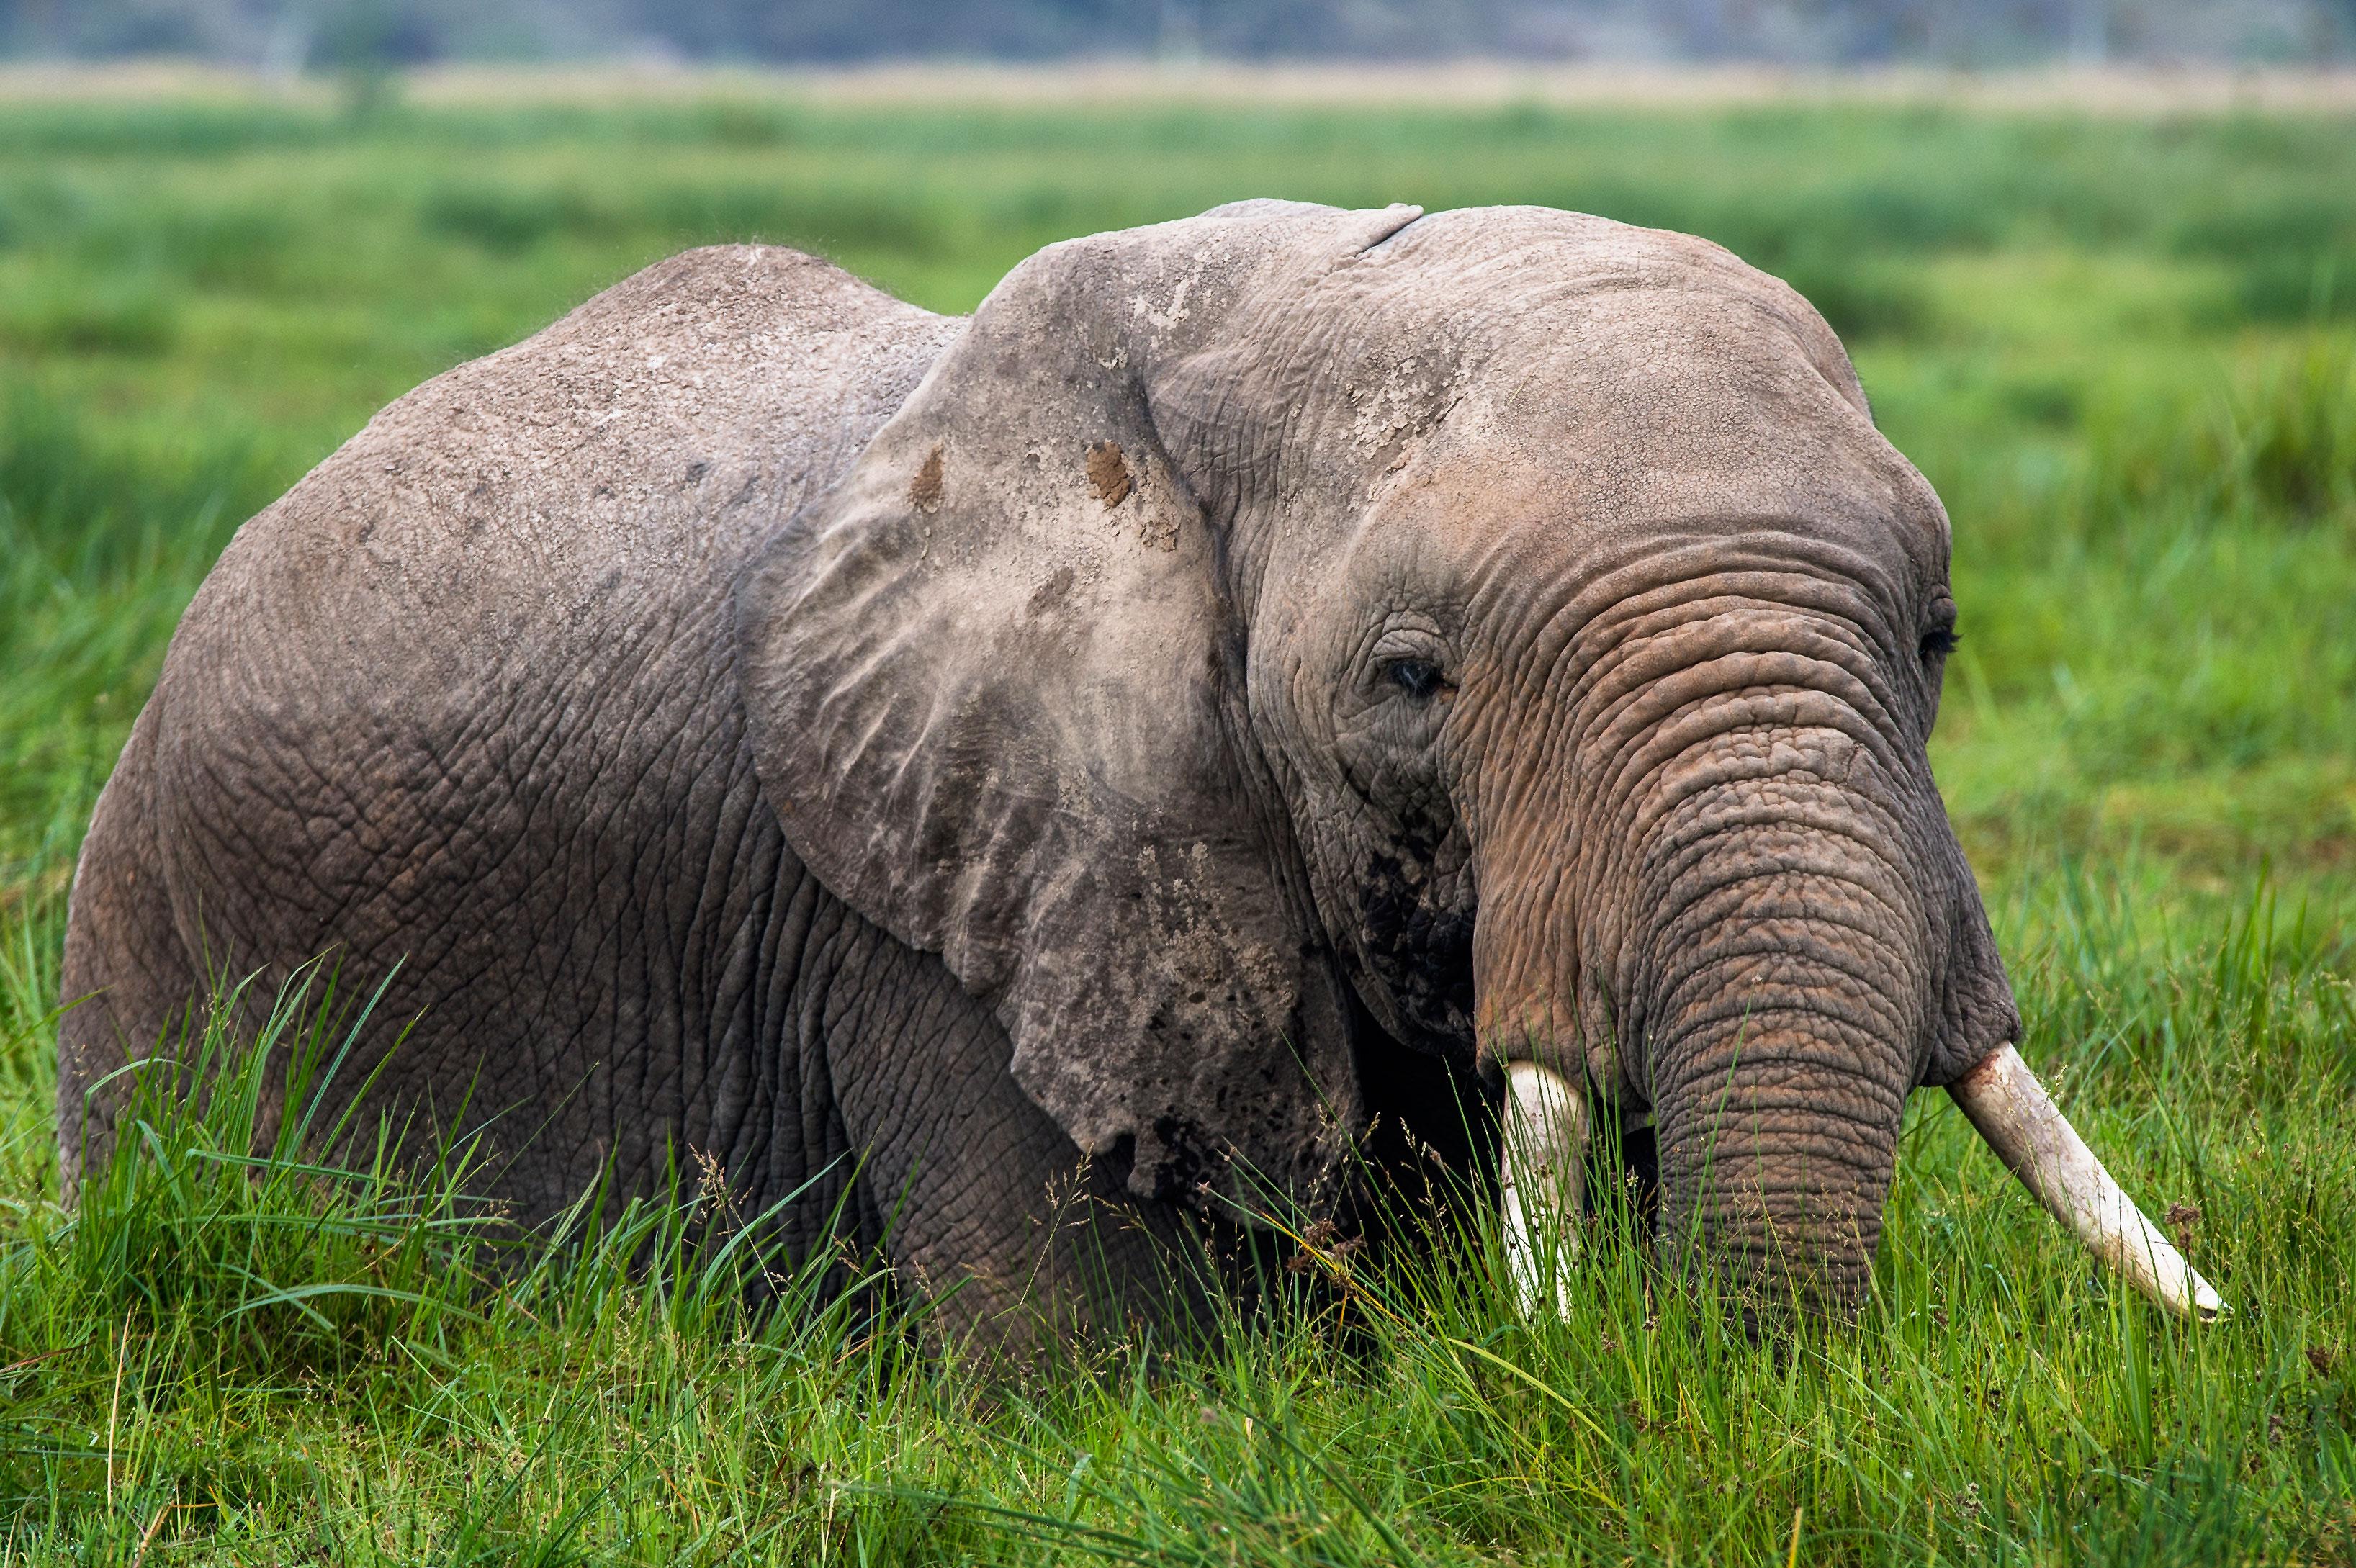 40x60 leinwand afrikanischer elefant. Black Bedroom Furniture Sets. Home Design Ideas